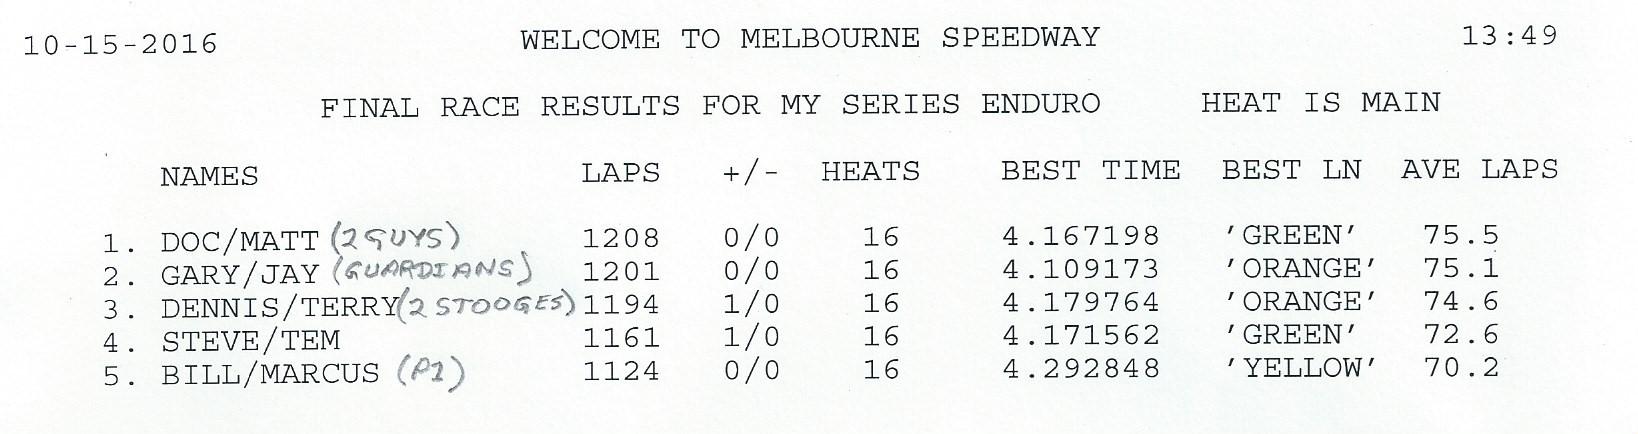 MS Enduro race results Melbourne 10-15-2016.jpg